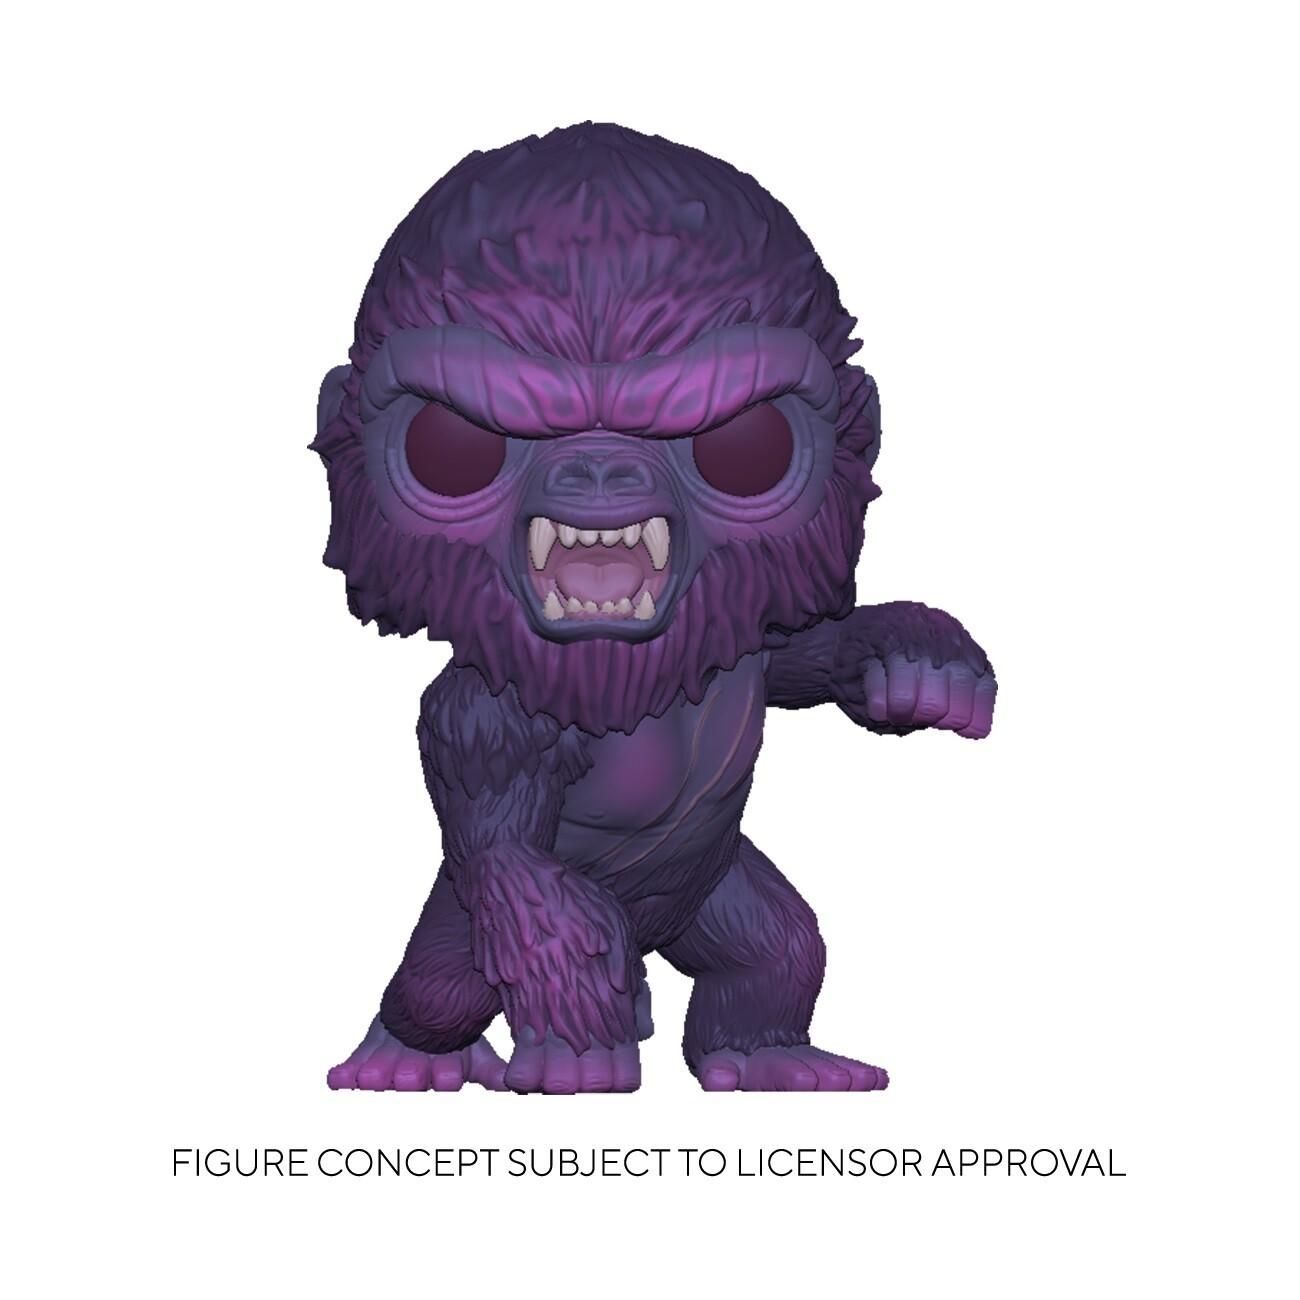 PRE-ORDER Funko Godzilla vs. Kong - Kong City Lights Walmart Exclusive 10-Inch Pop! Vinyl Figure